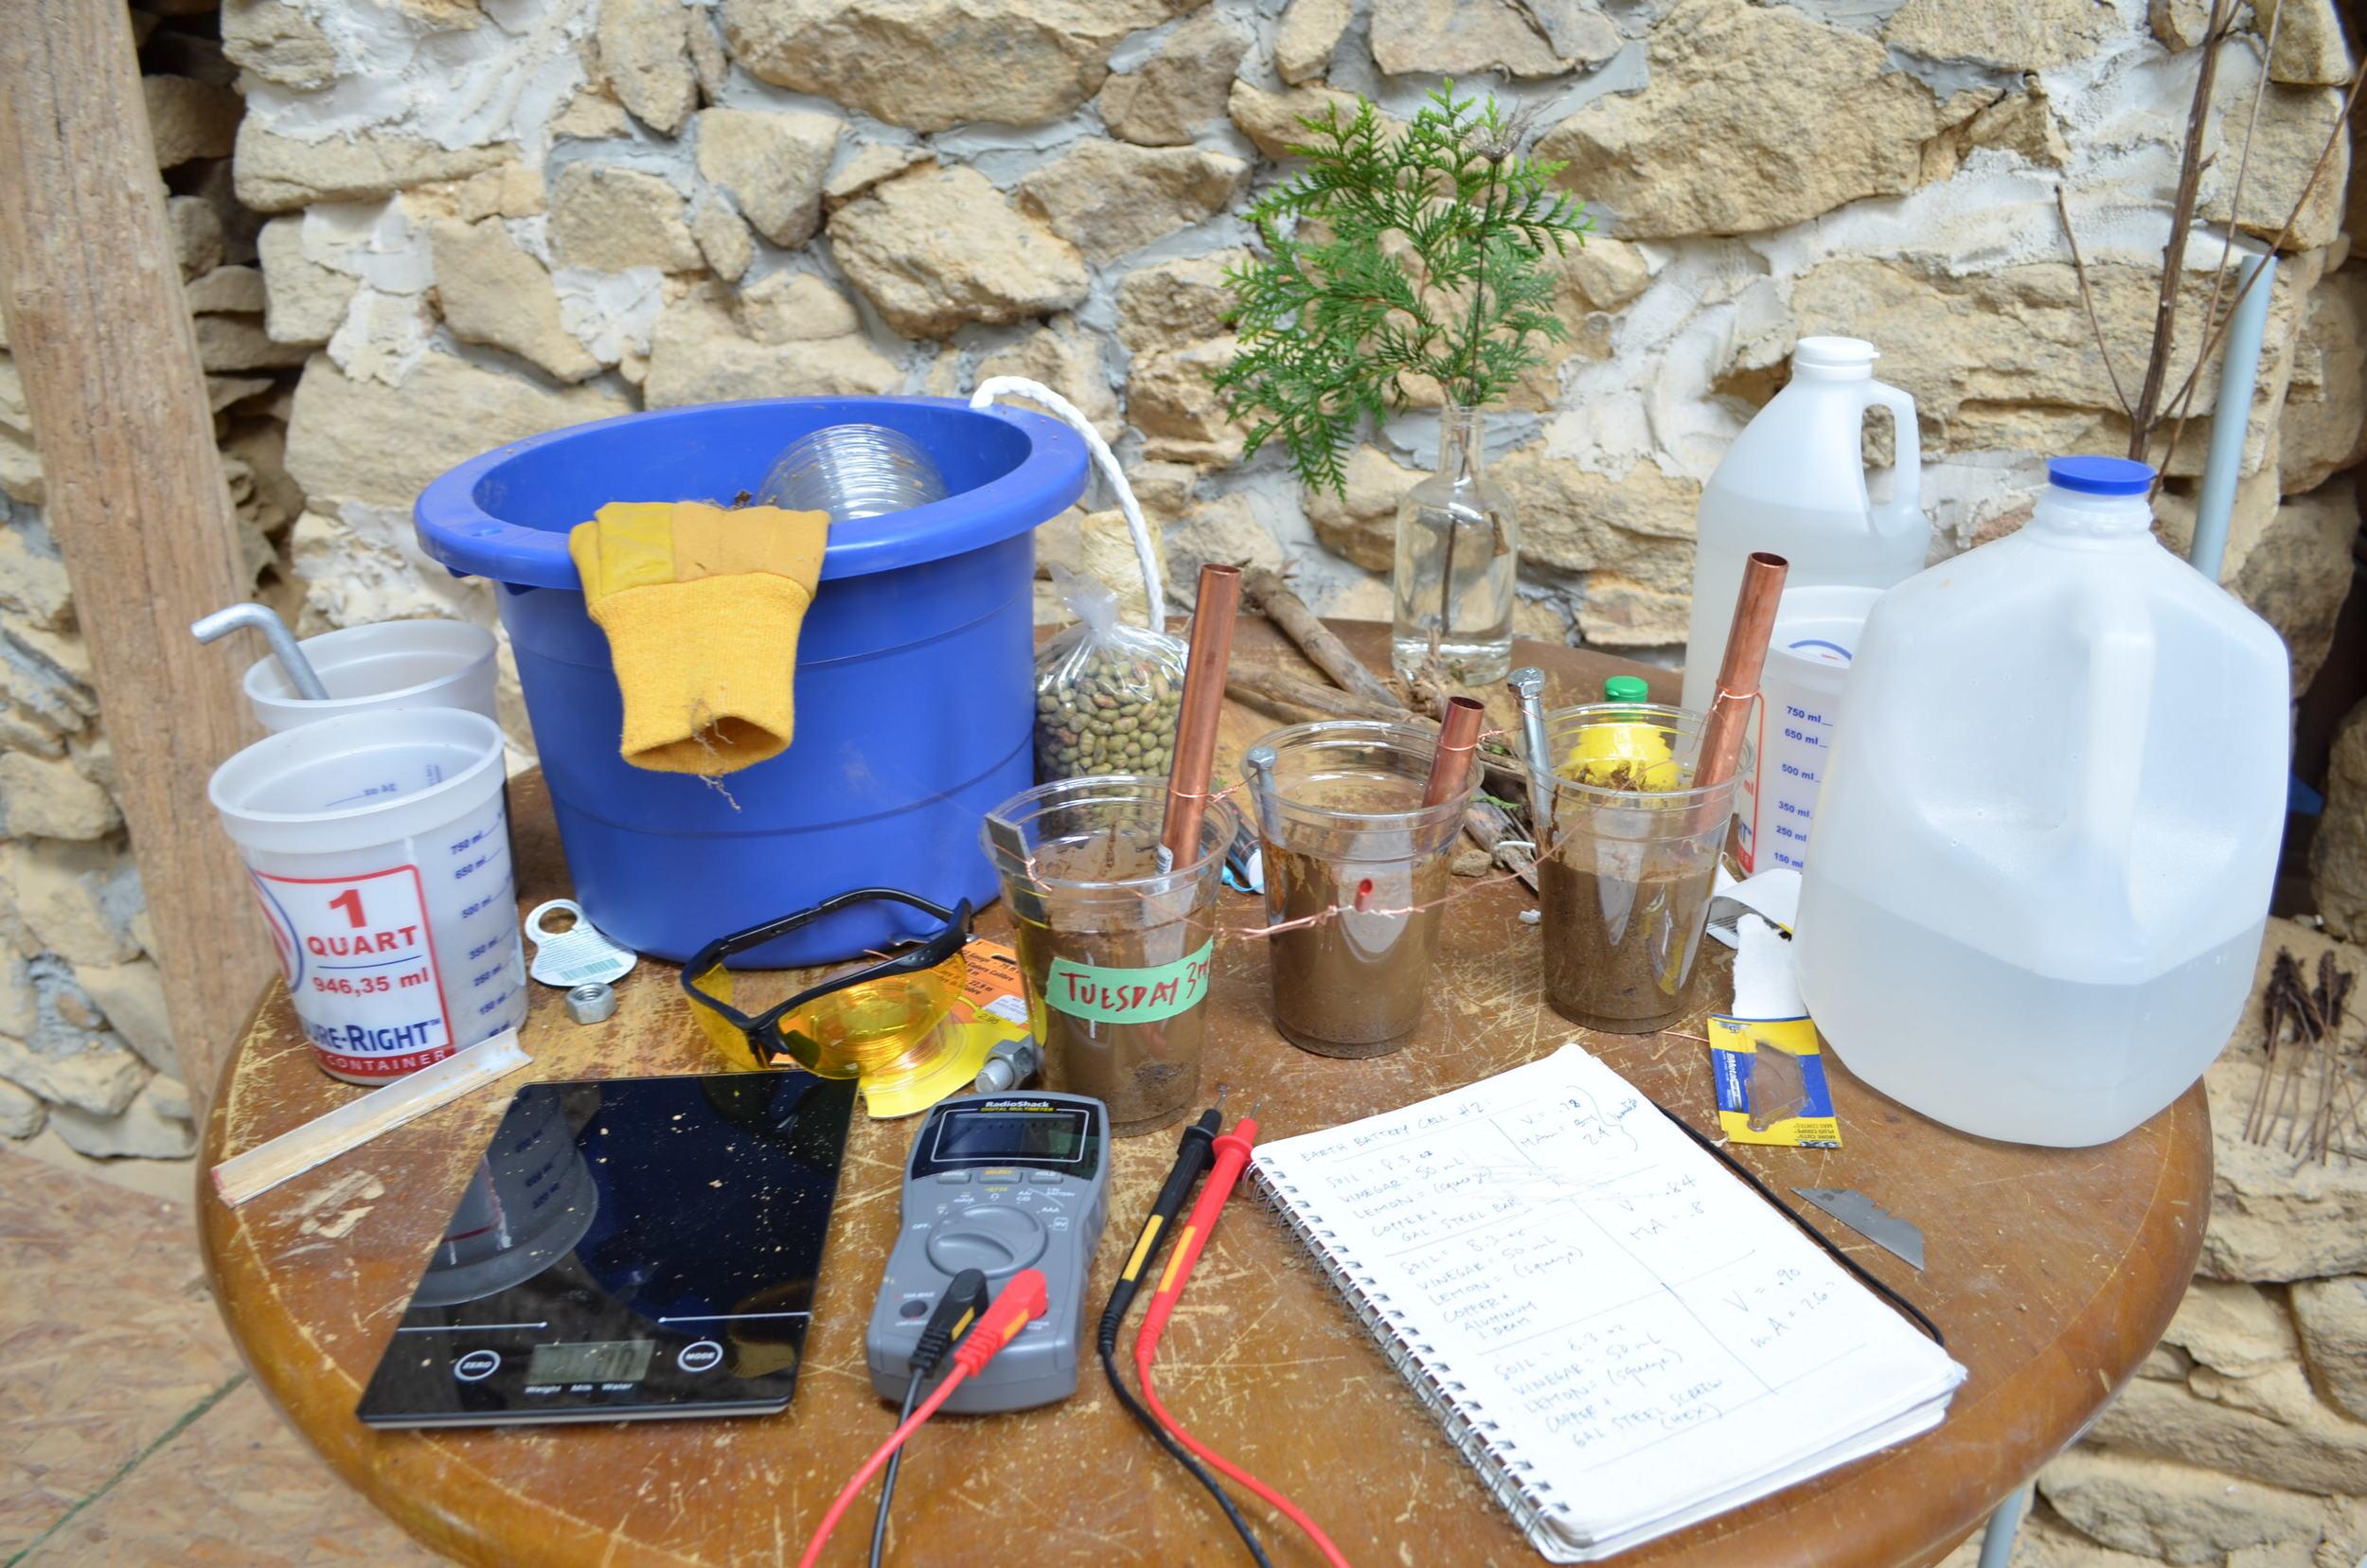 Earth battery experimentation.